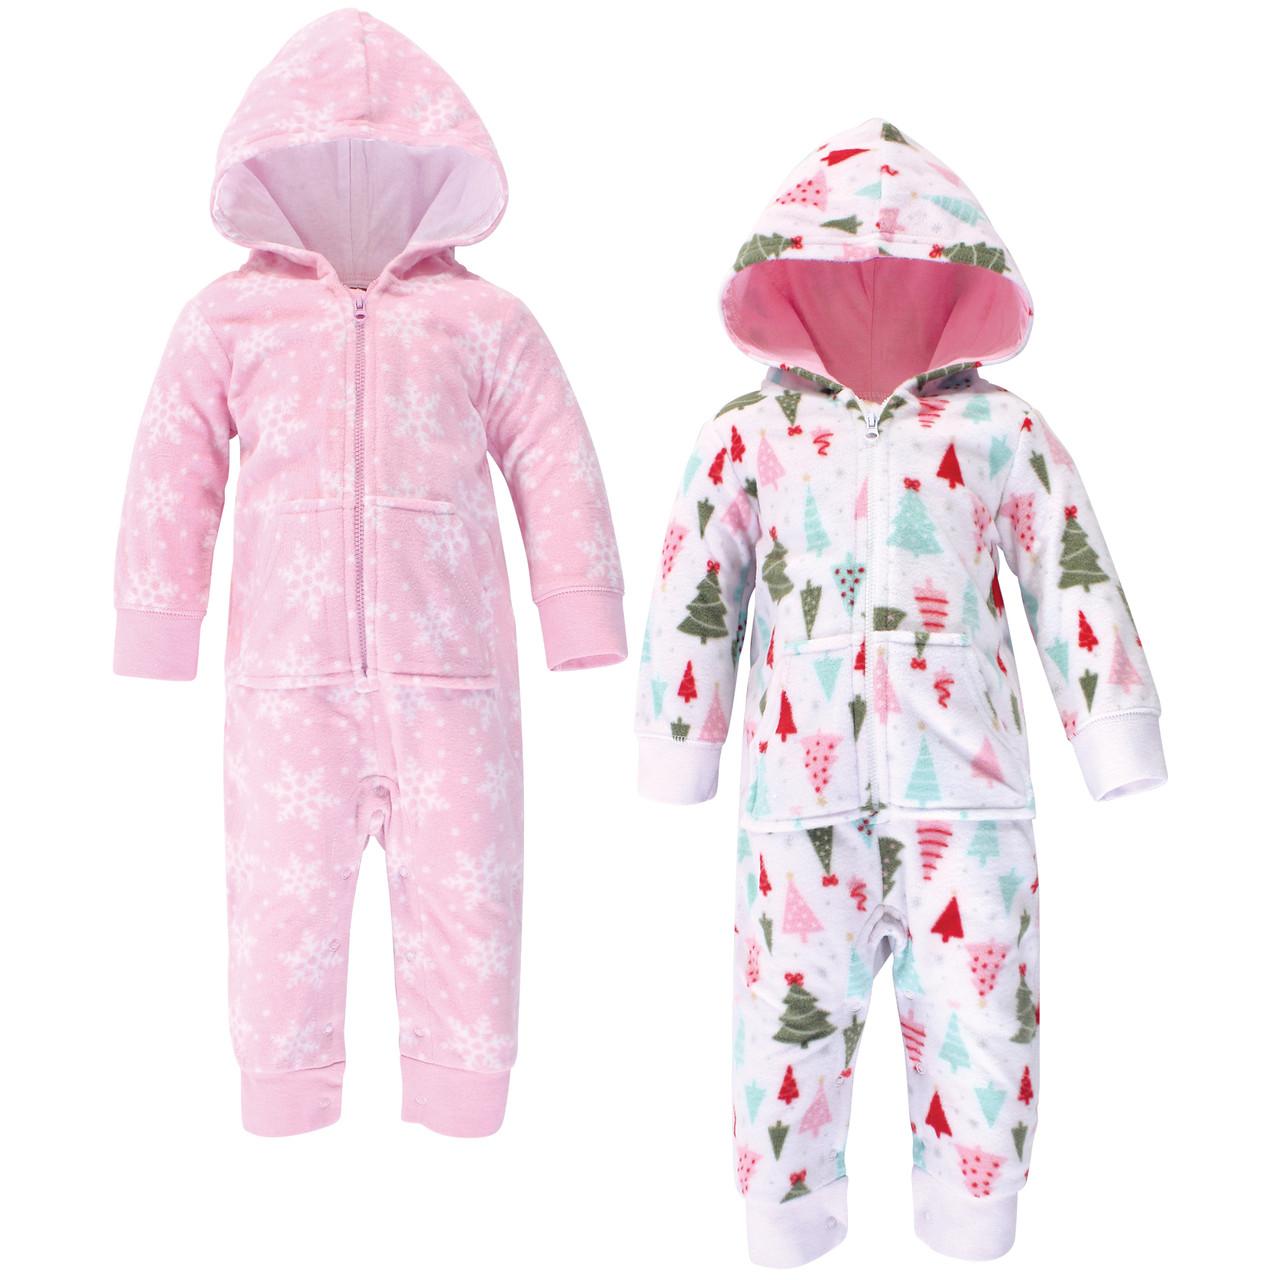 Hudson Baby Girl Toddler Fleece Jumpsuits 2-Pack Gray//Pink Snowflake